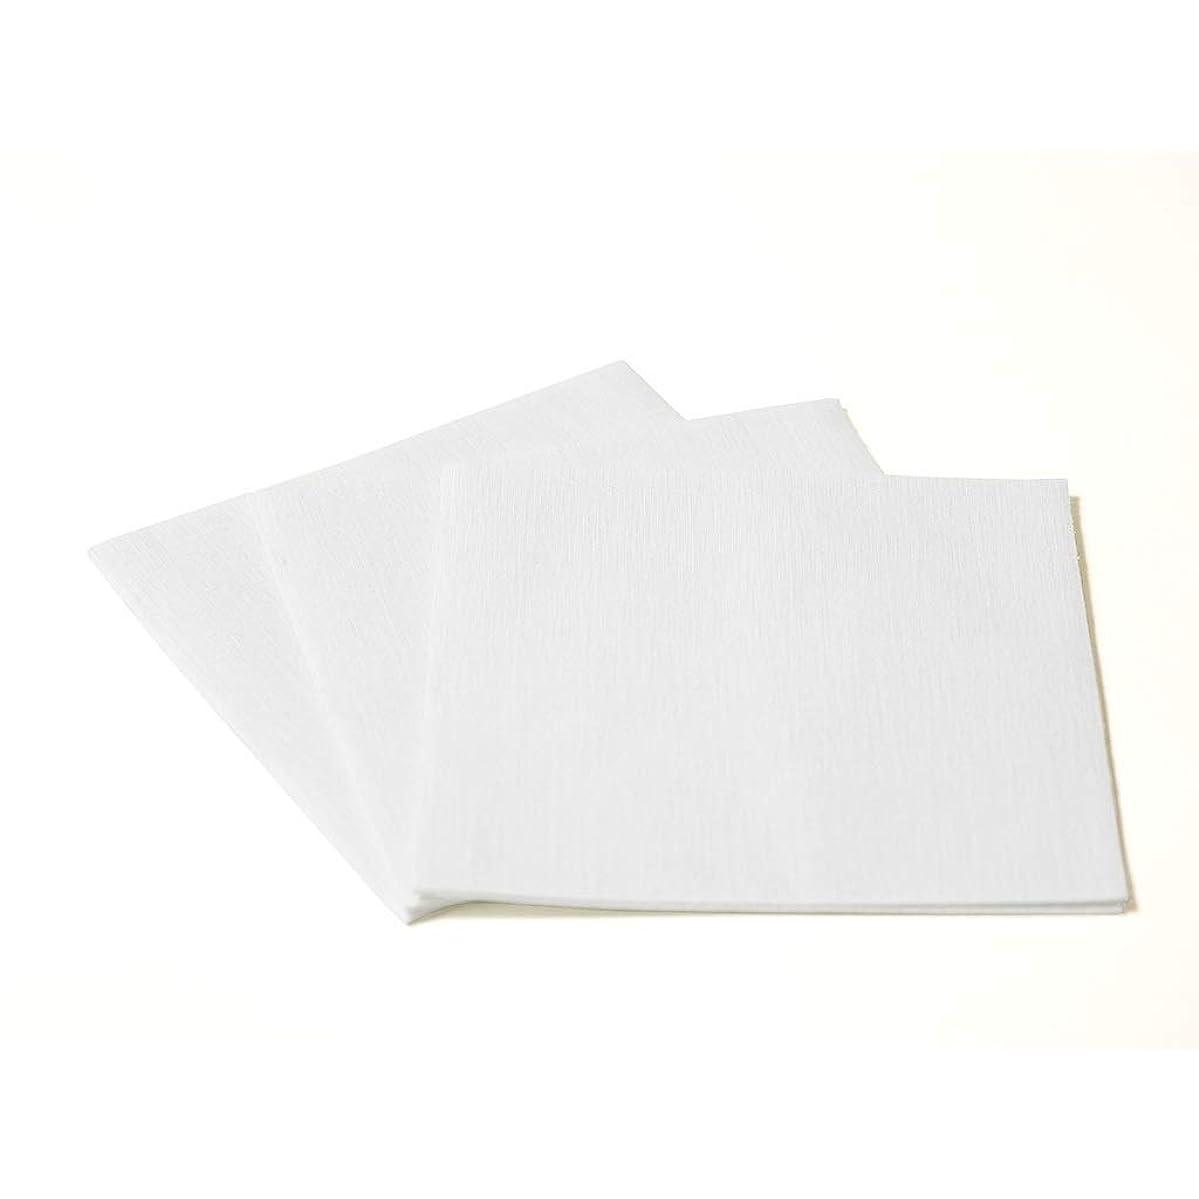 The Napkins Deluxe Classic Entertaining Napkin - Polar White Luxury Paper Napkin - Feels Like Cloth